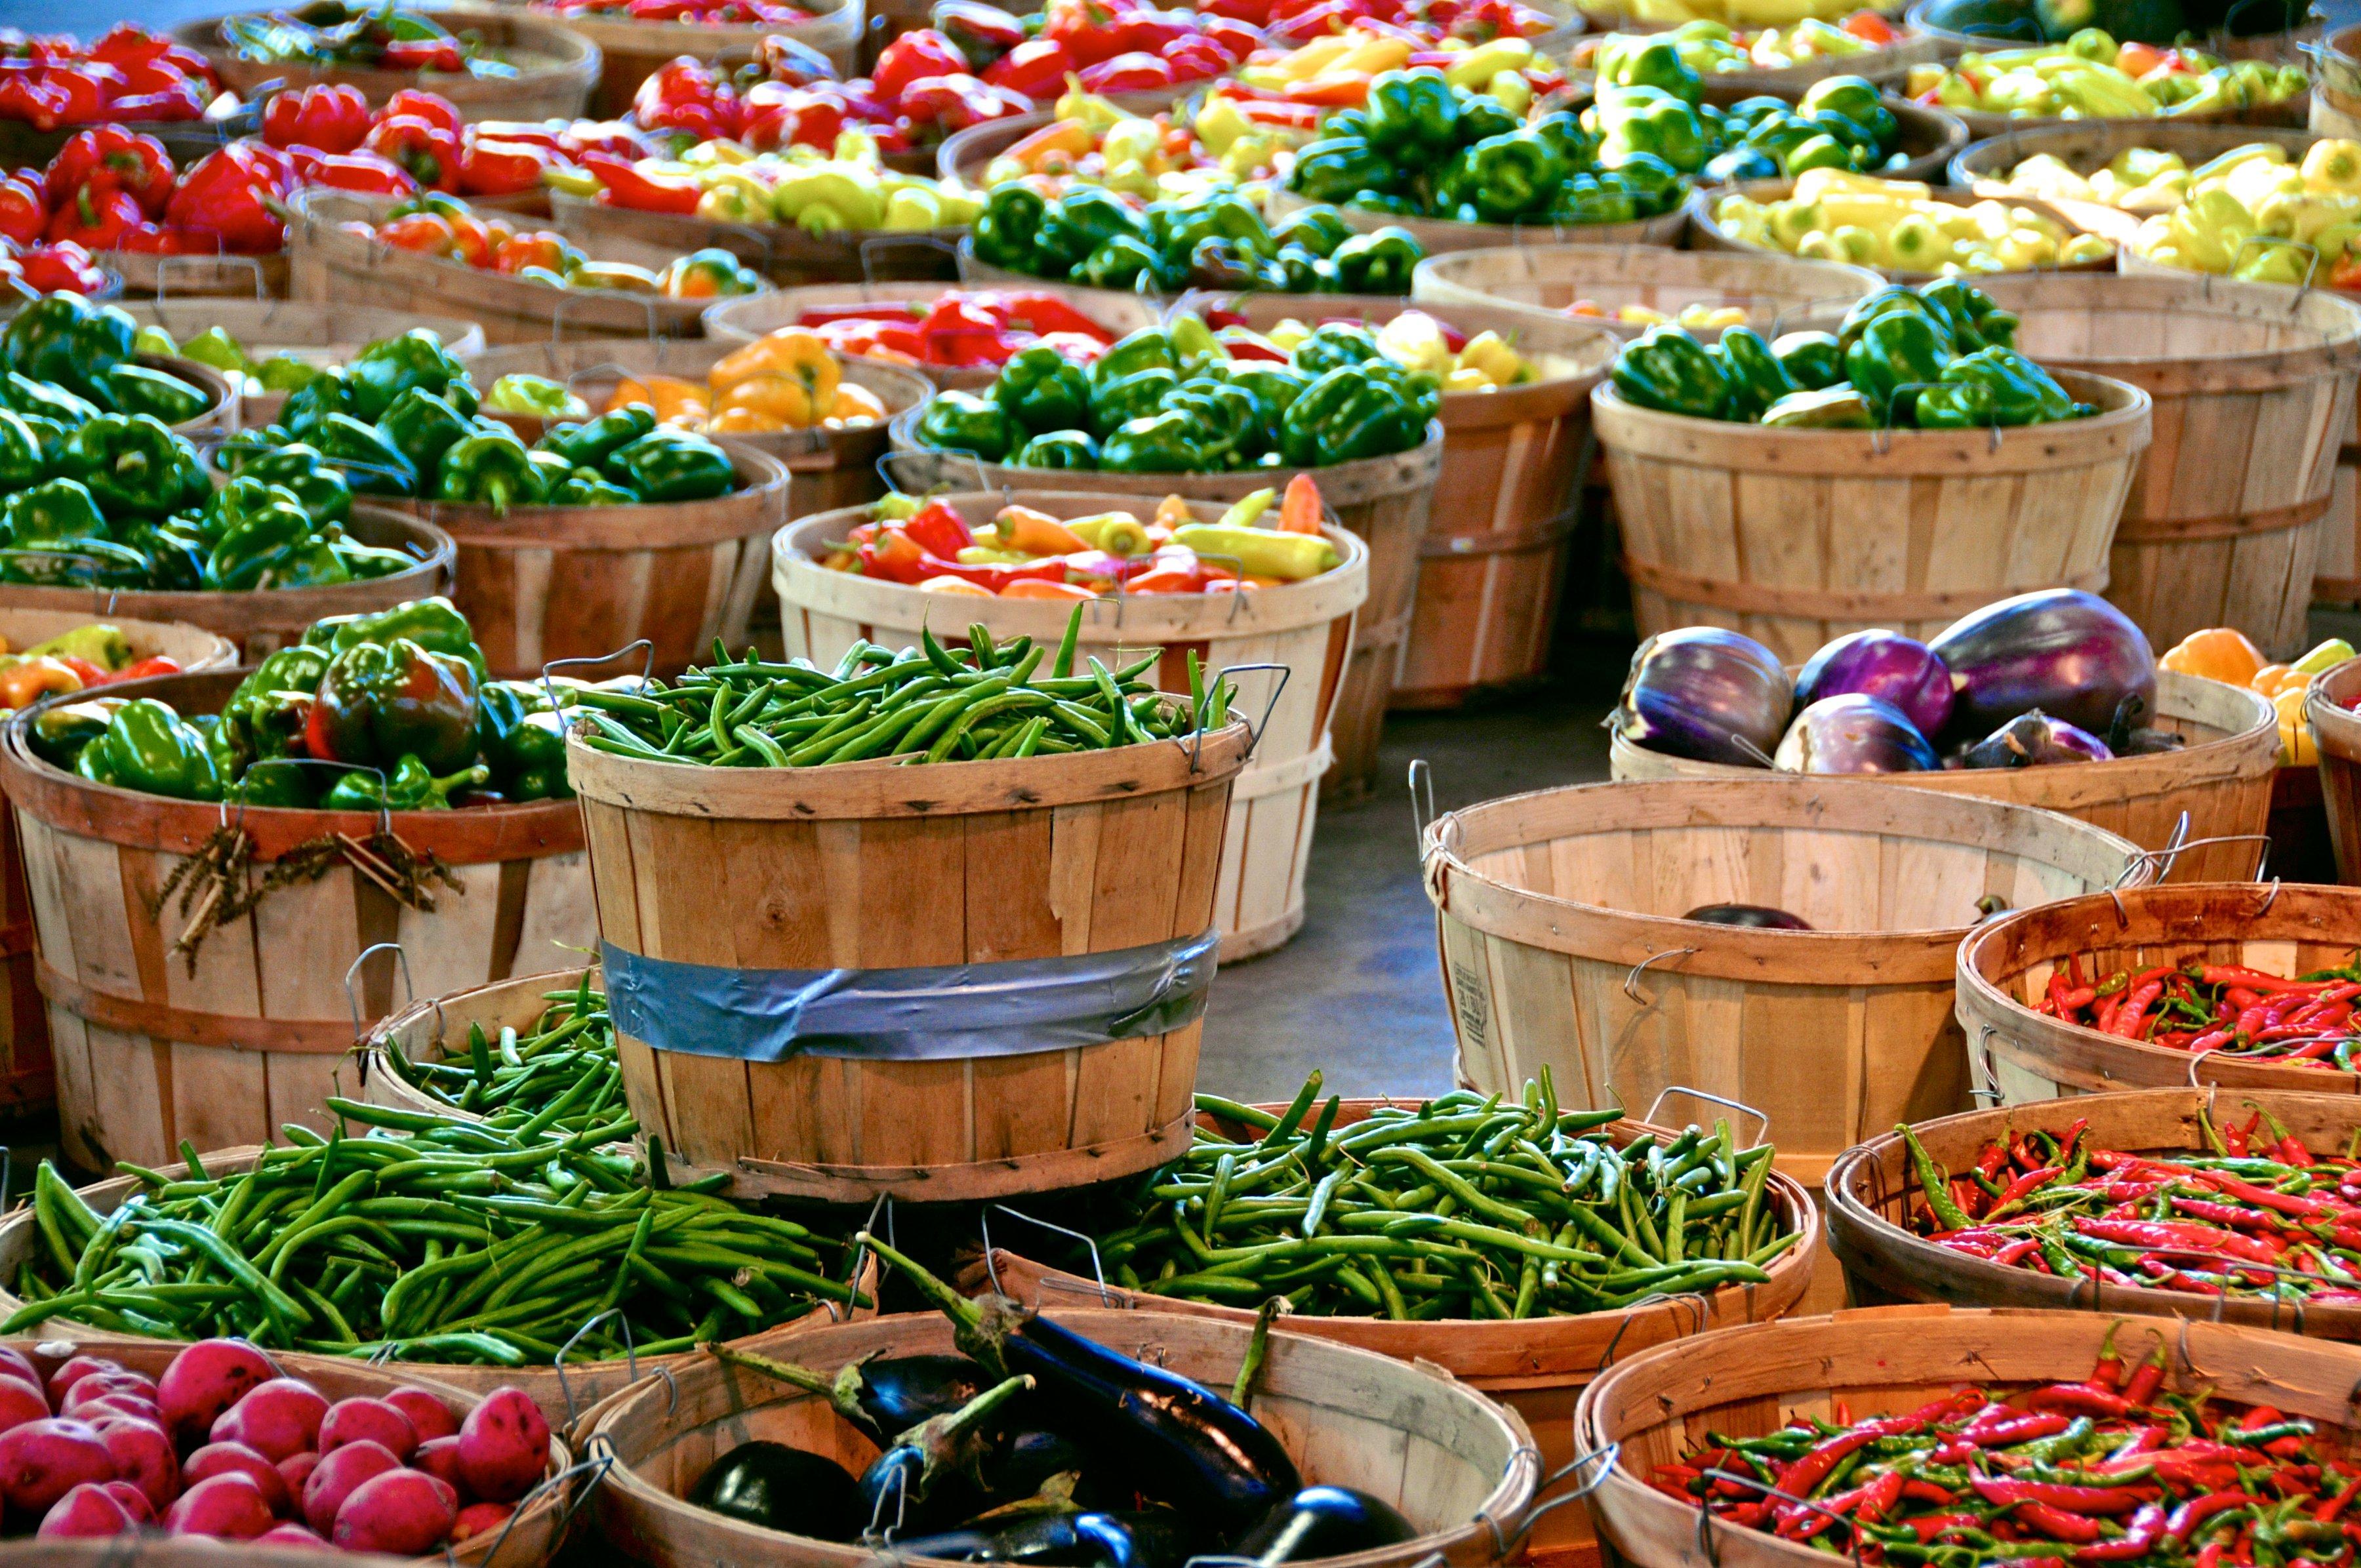 Canva - Detroits Eastern Market produce